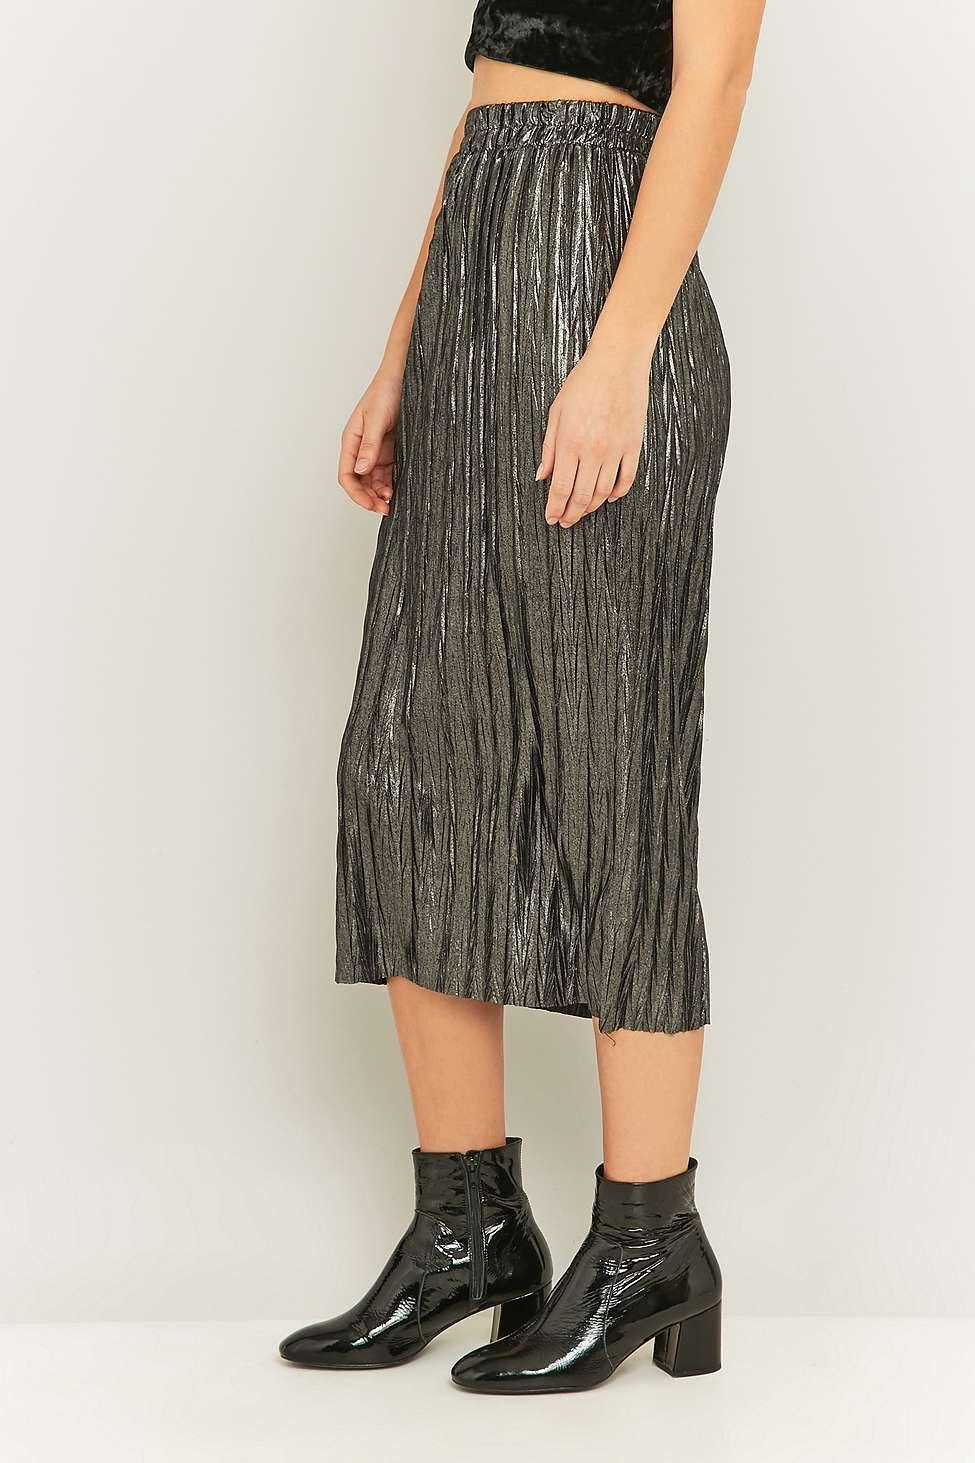 Pins & Needles Metallic Silver Pleated Midi Skirt | Shops, Skirts ...